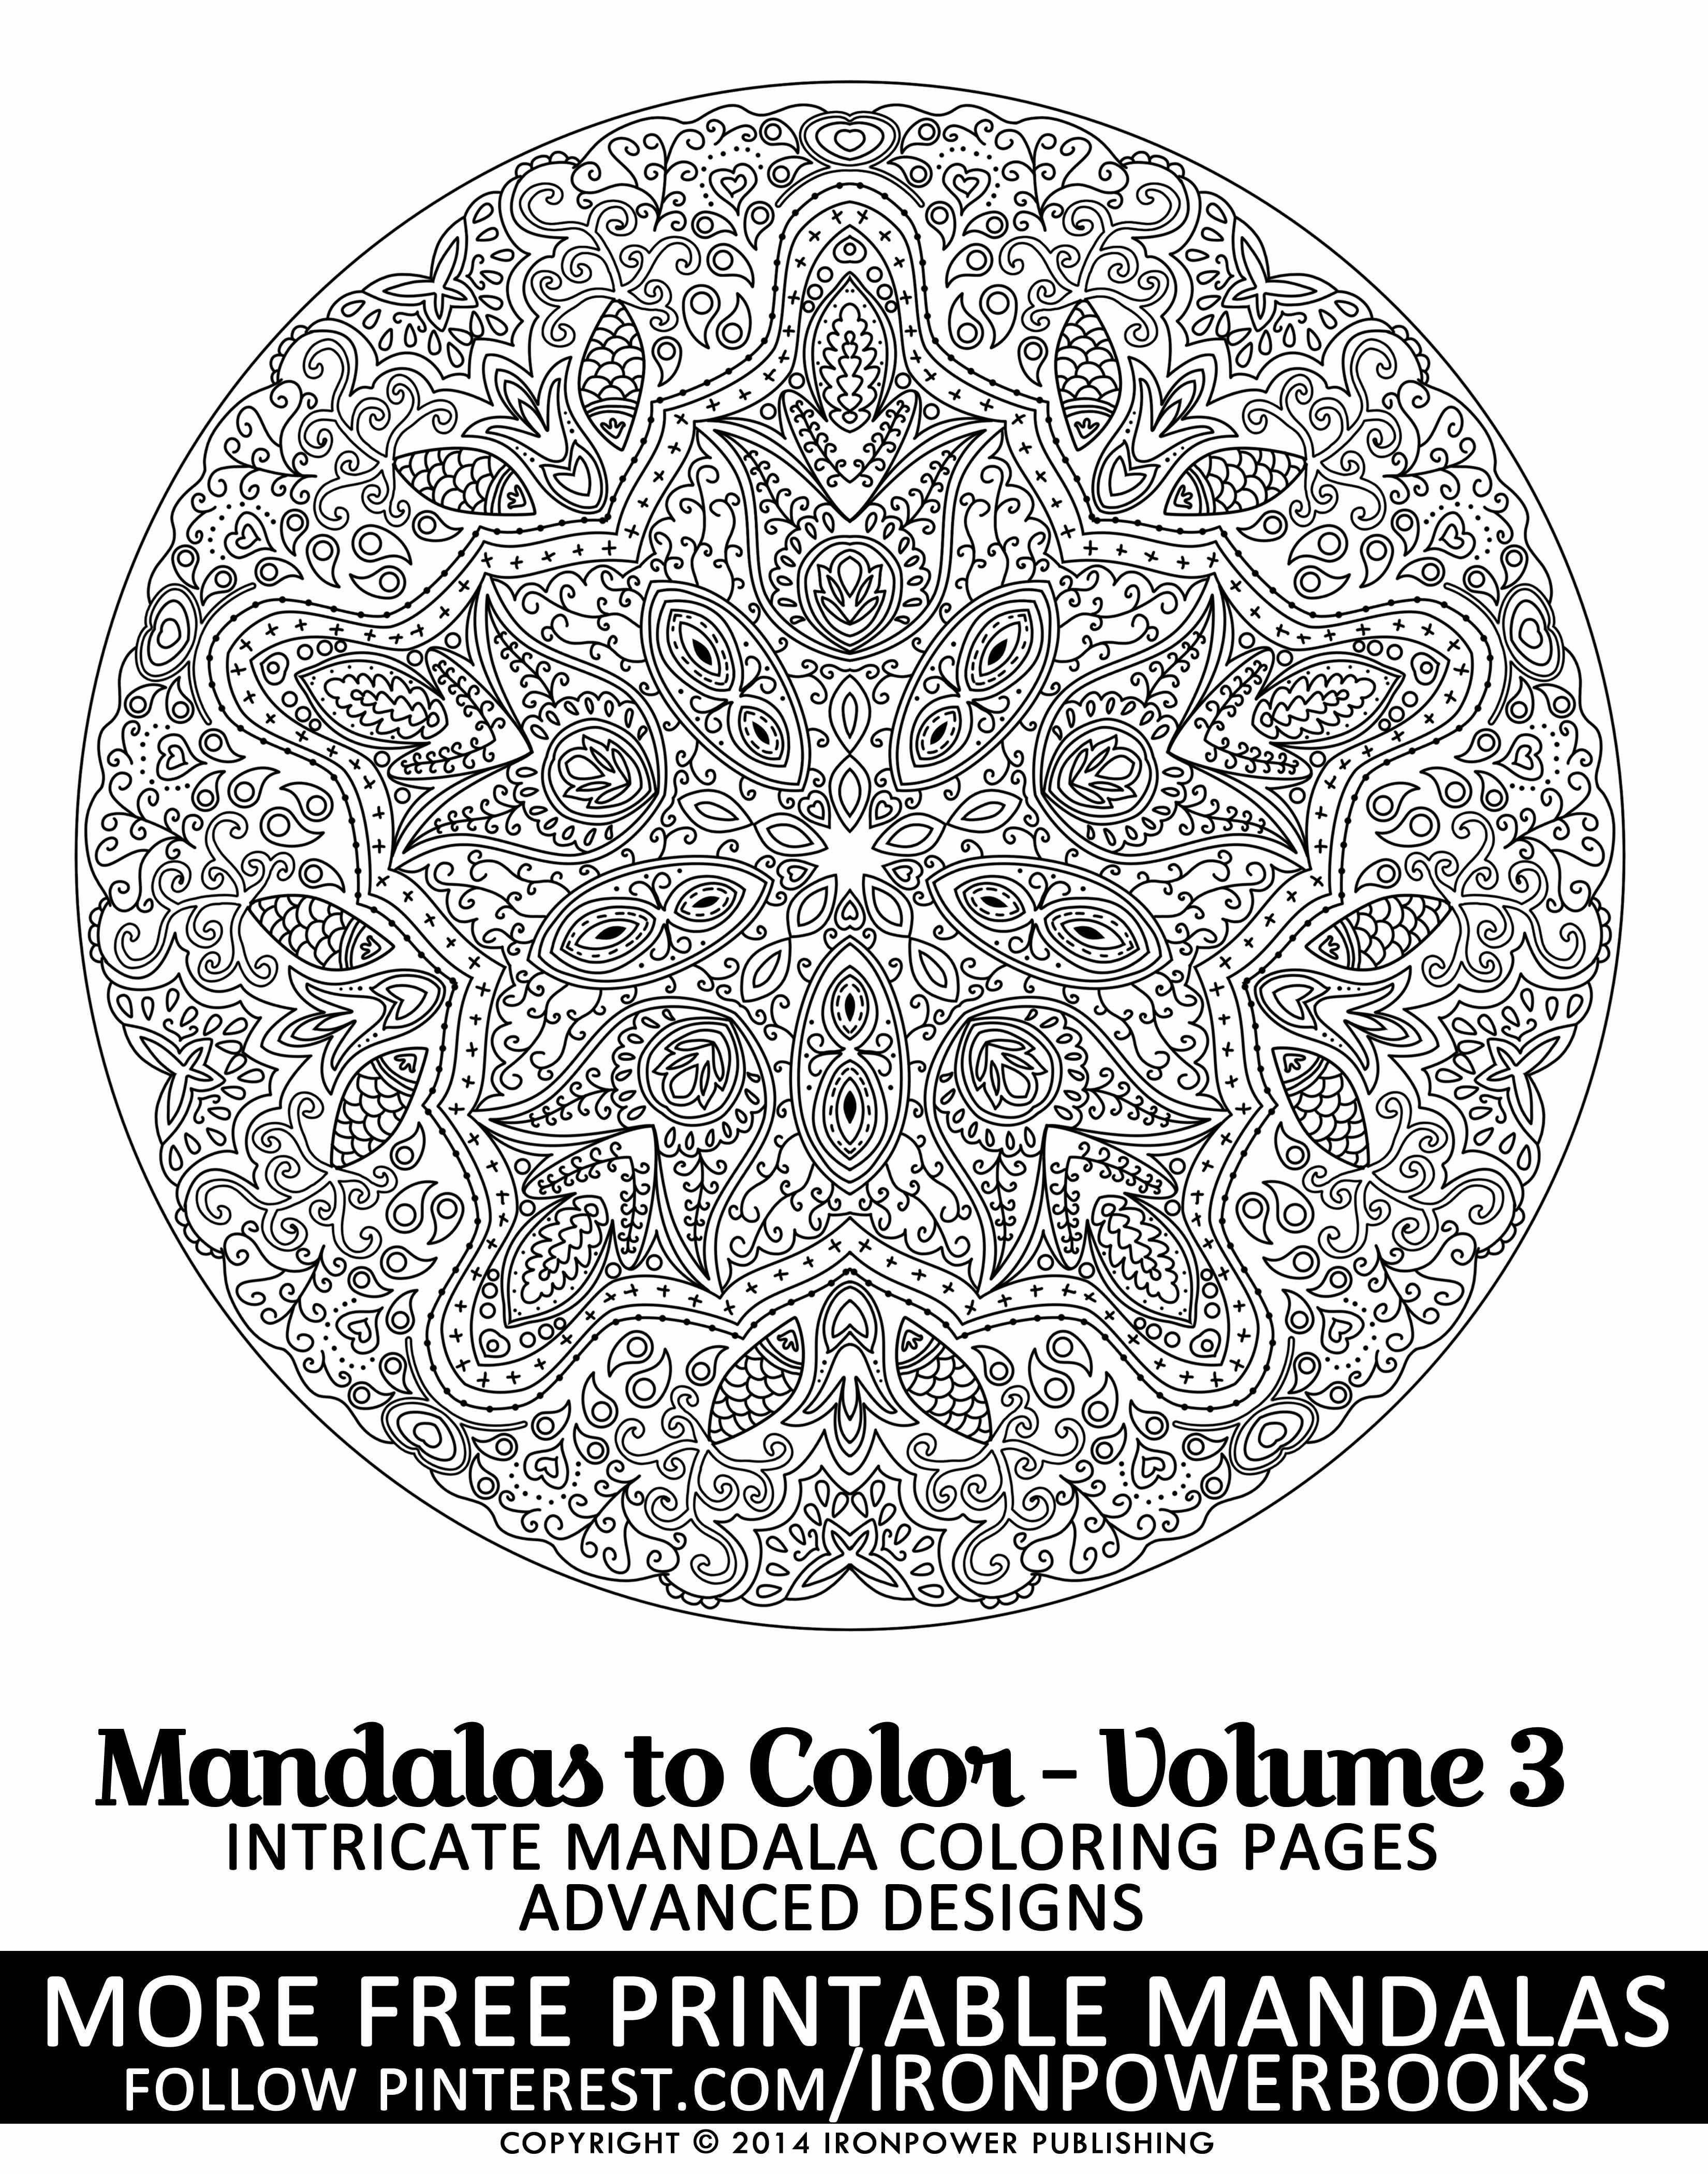 Intricate Mandala Design to Color | Art Therapy | Mandala Intricate ...